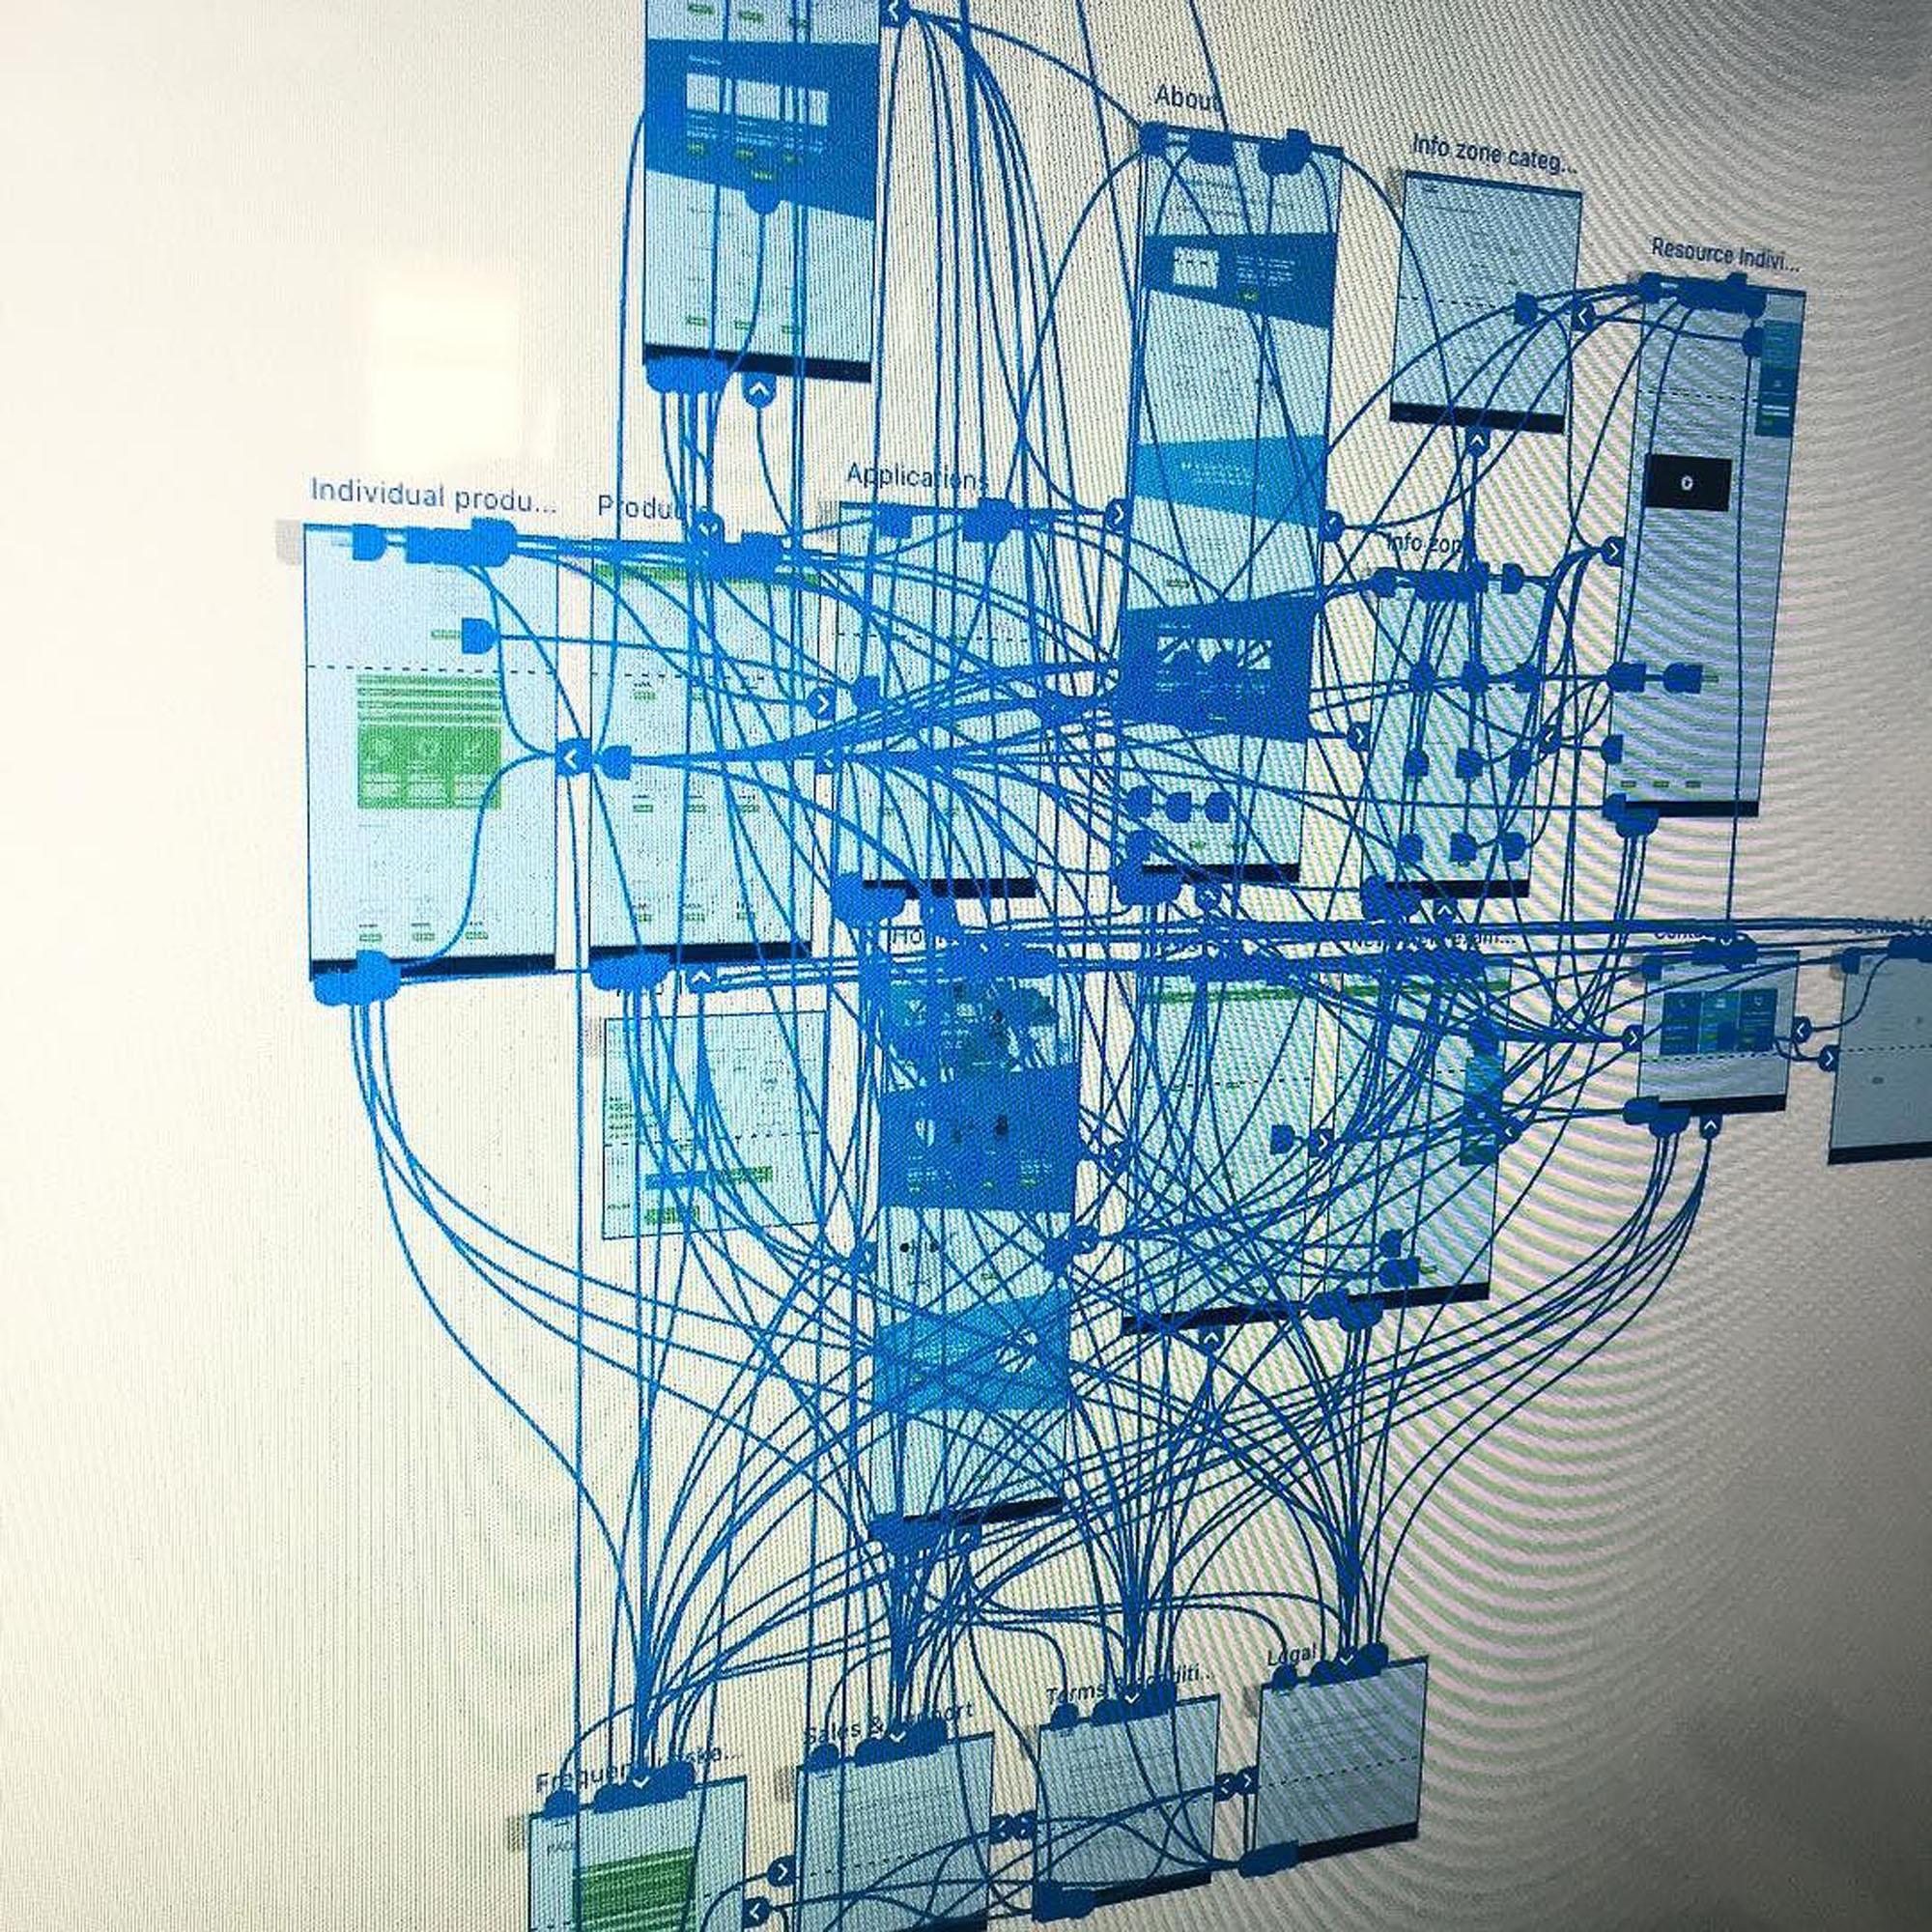 working-wireframes-looking-like-some-kind-of-scribbled-pirate-ship-wireframes-webdevelopment-website-websitedesign-studiolife_33720284862_o.jpg